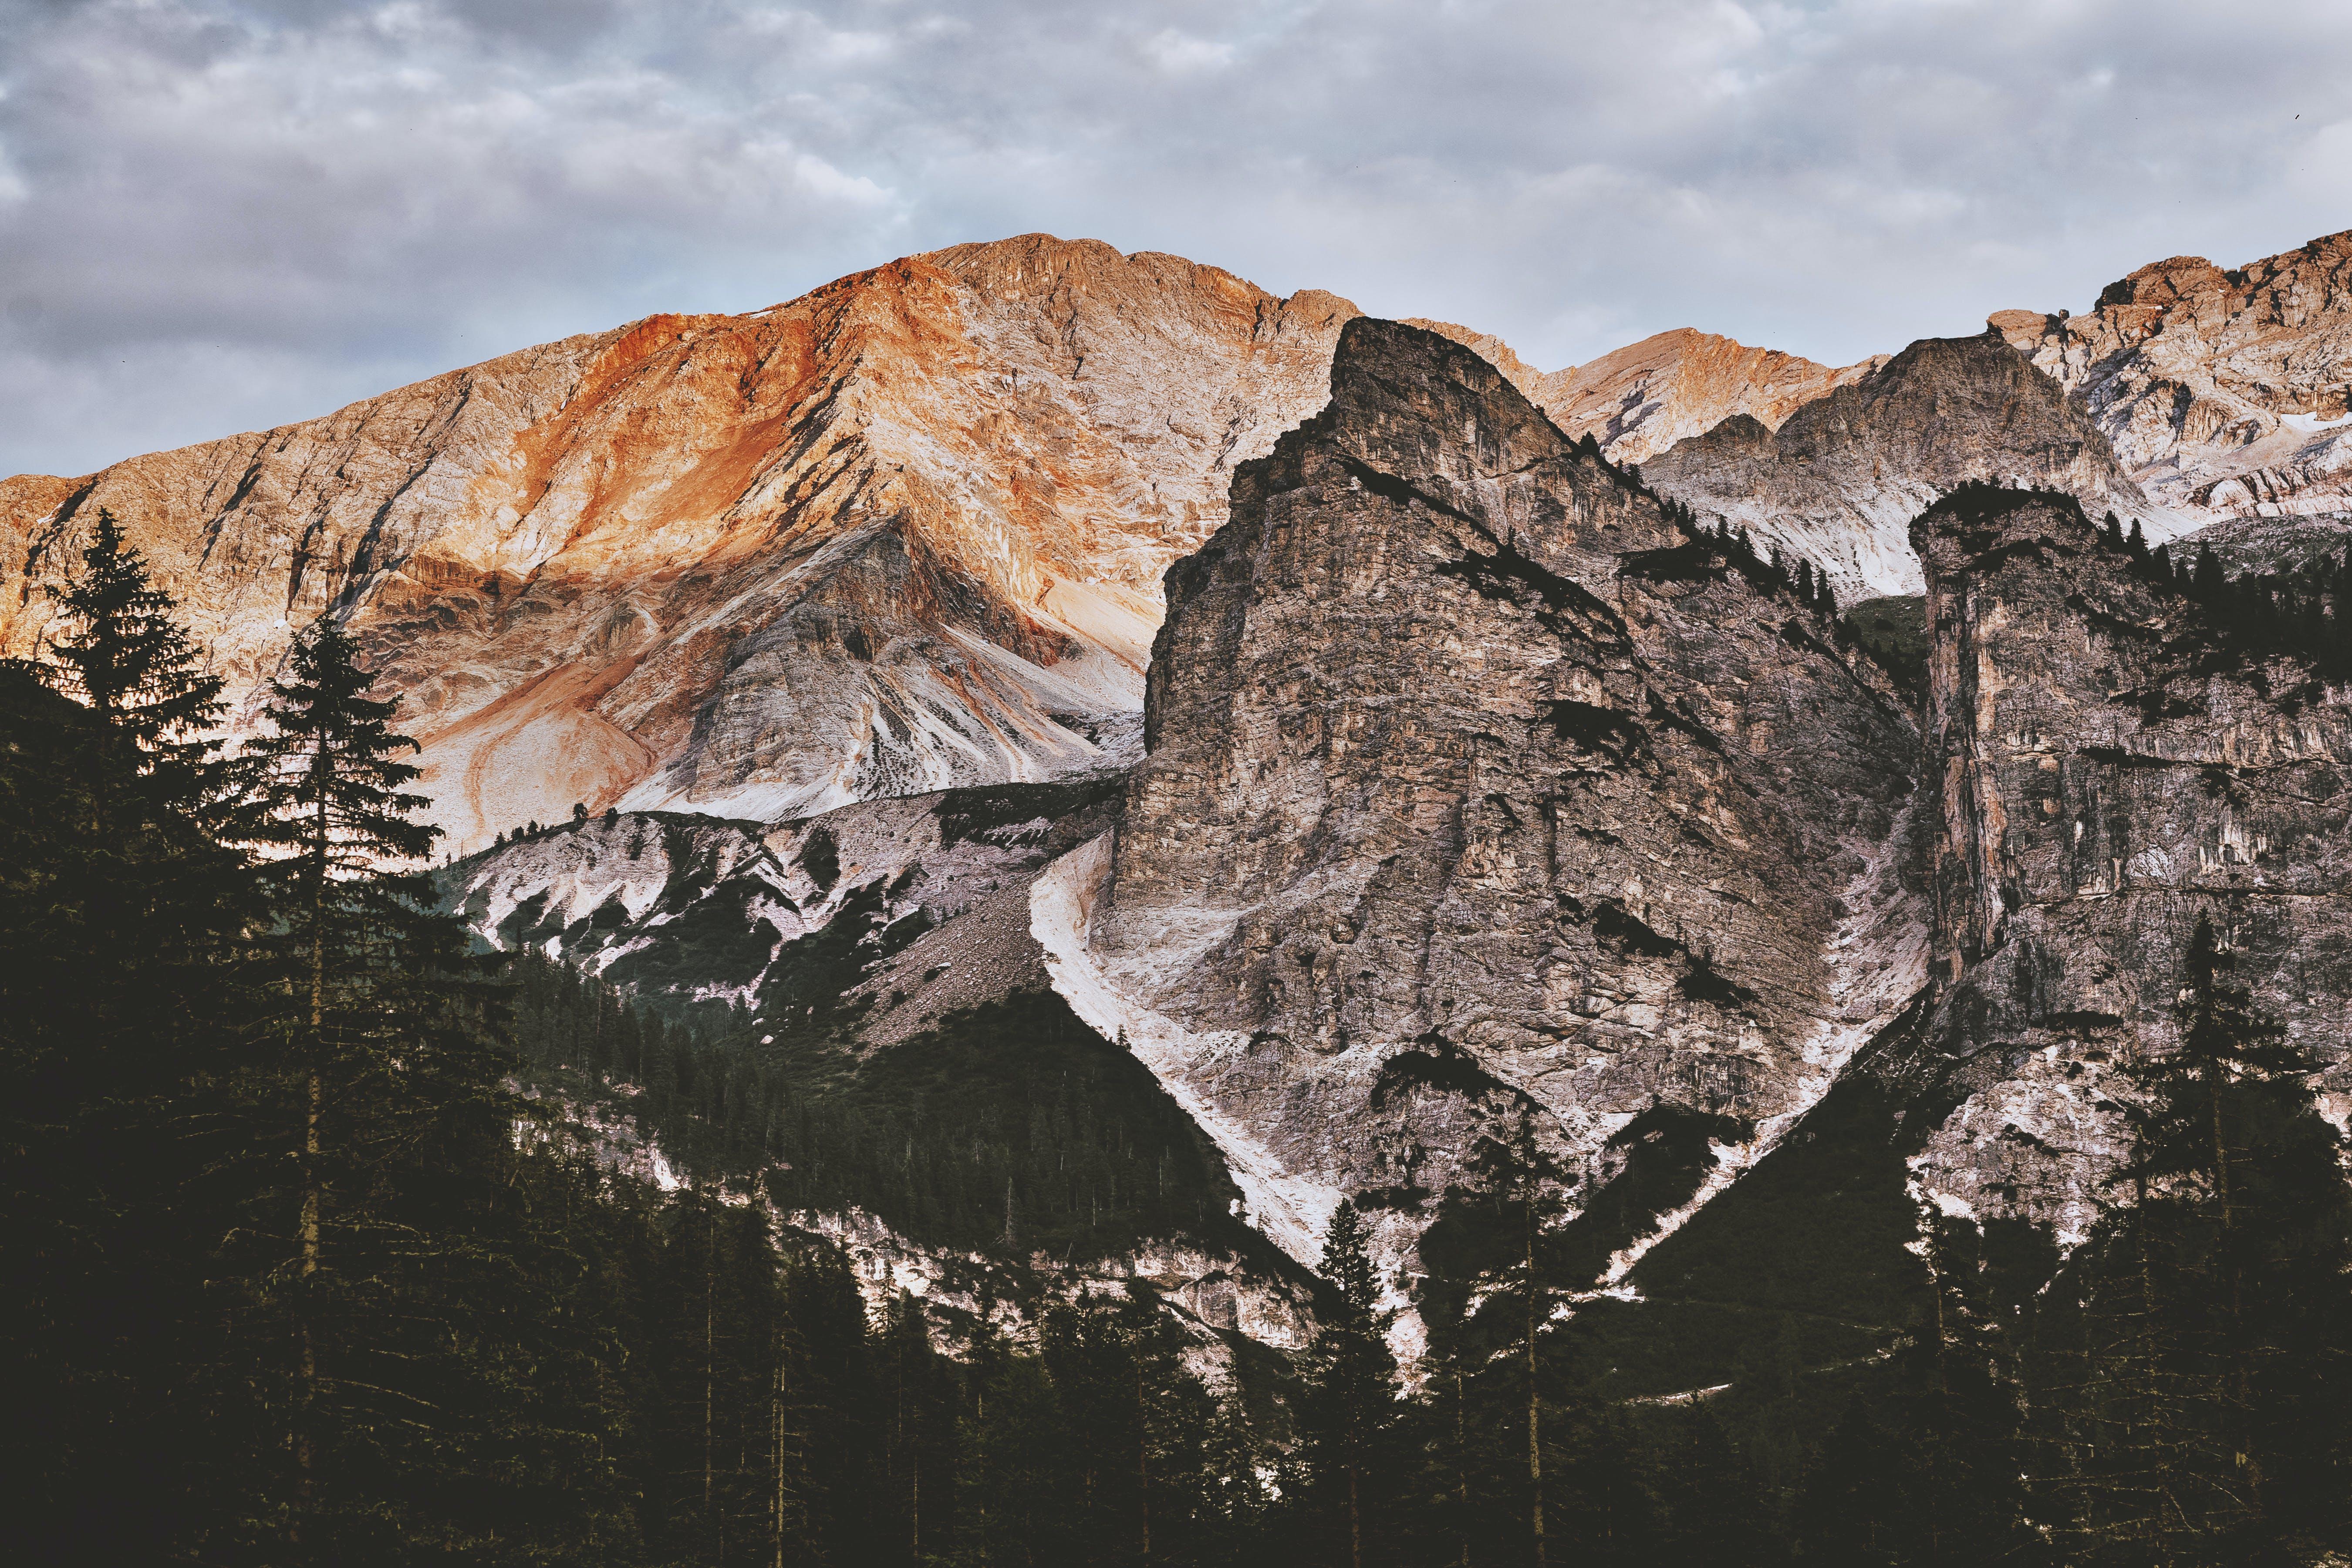 Landscape Photography Of Rocky Mountain